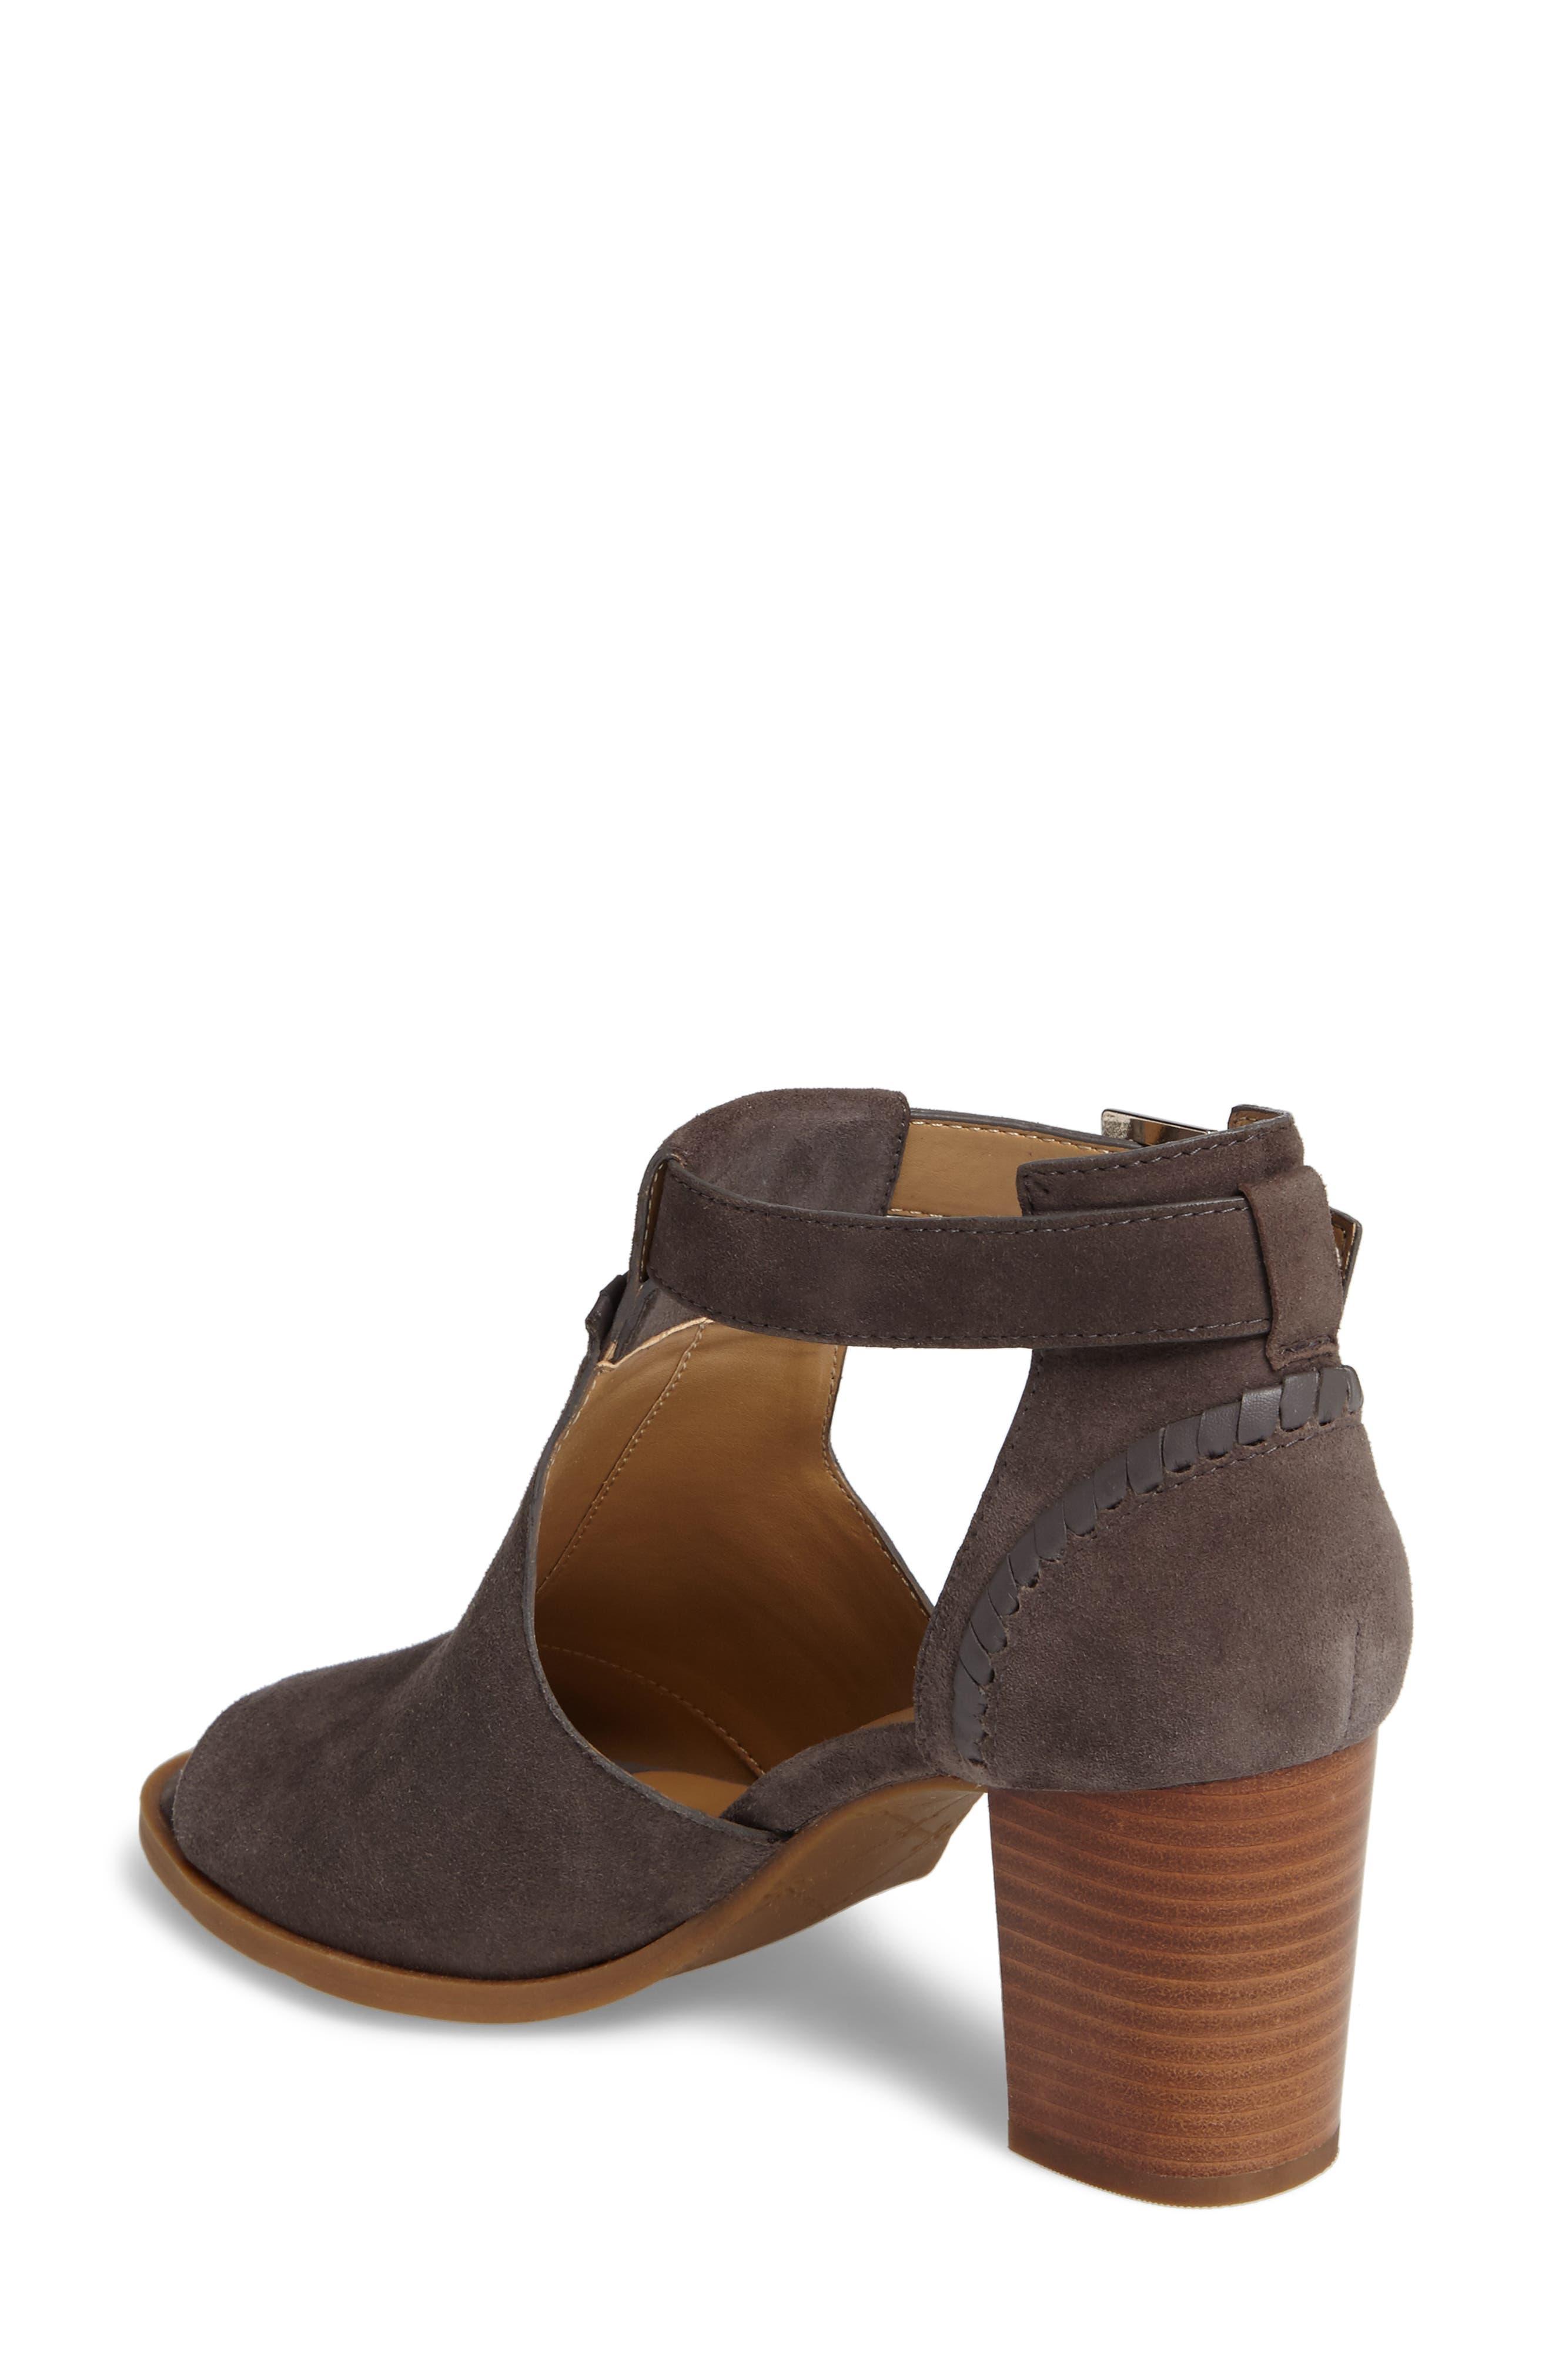 Cameron Block Heel Sandal,                             Alternate thumbnail 13, color,